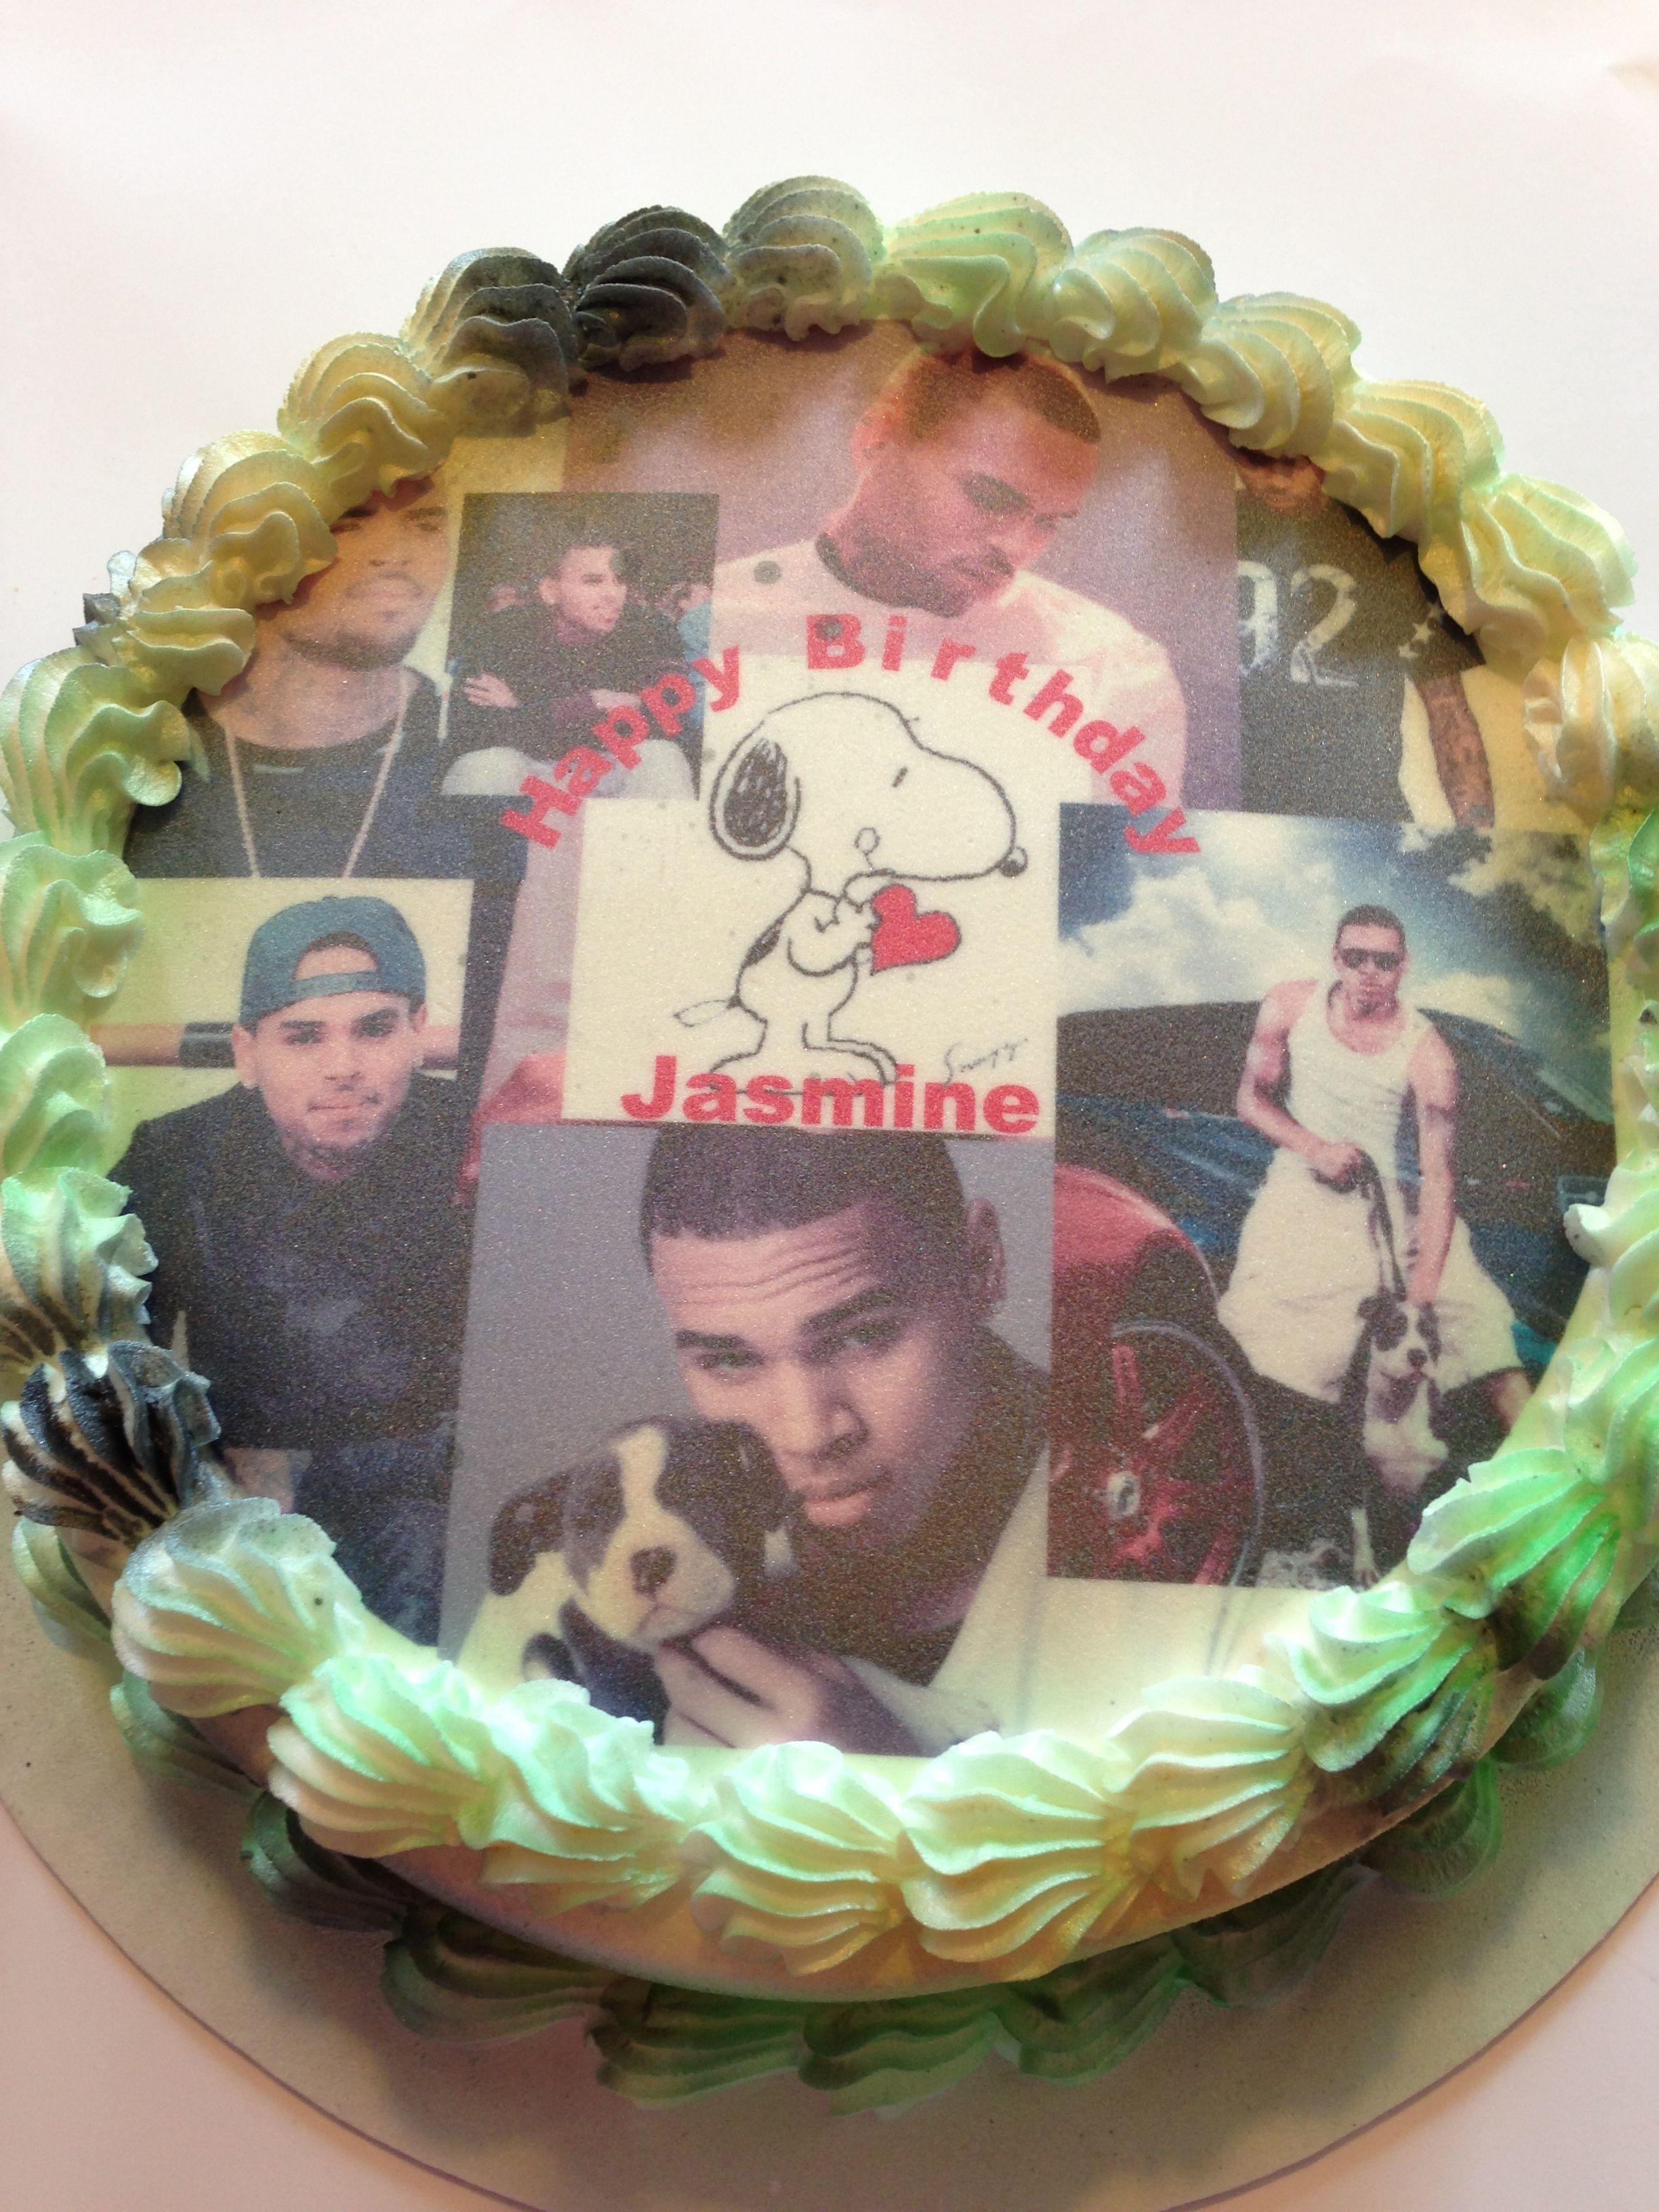 Tremendous My Baby Girls Birthday Cake I Luv U Jazz Chris Brown Personalised Birthday Cards Veneteletsinfo